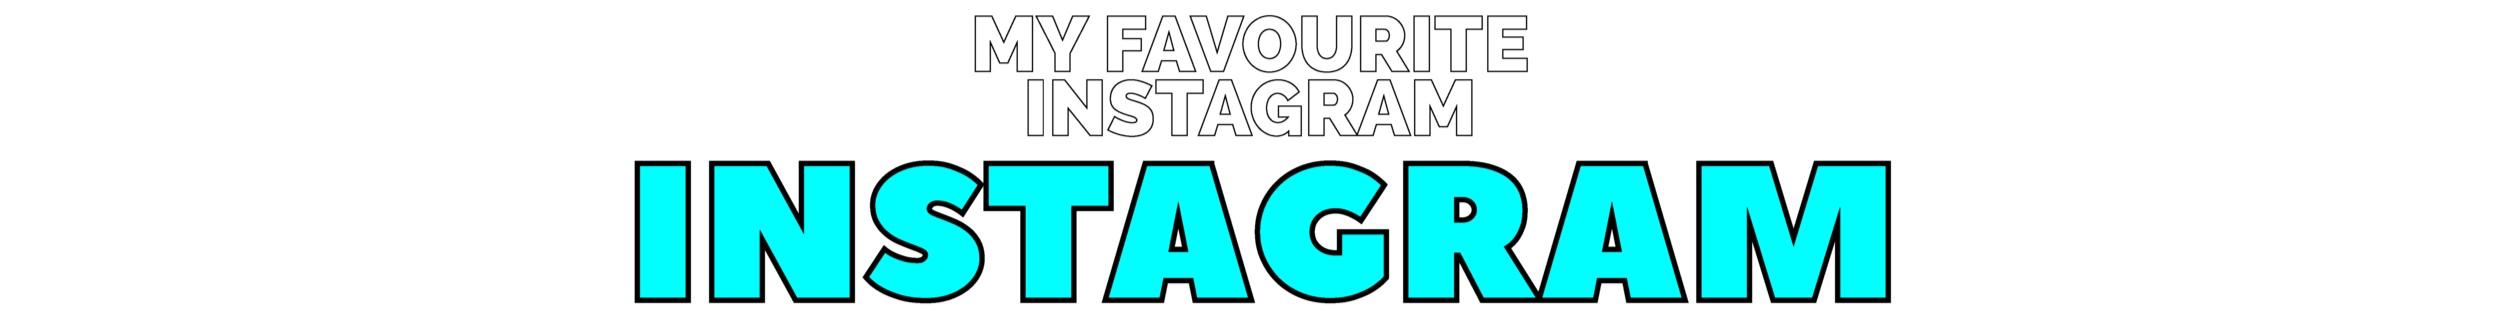 My+Favourite+Instagram-01.jpg